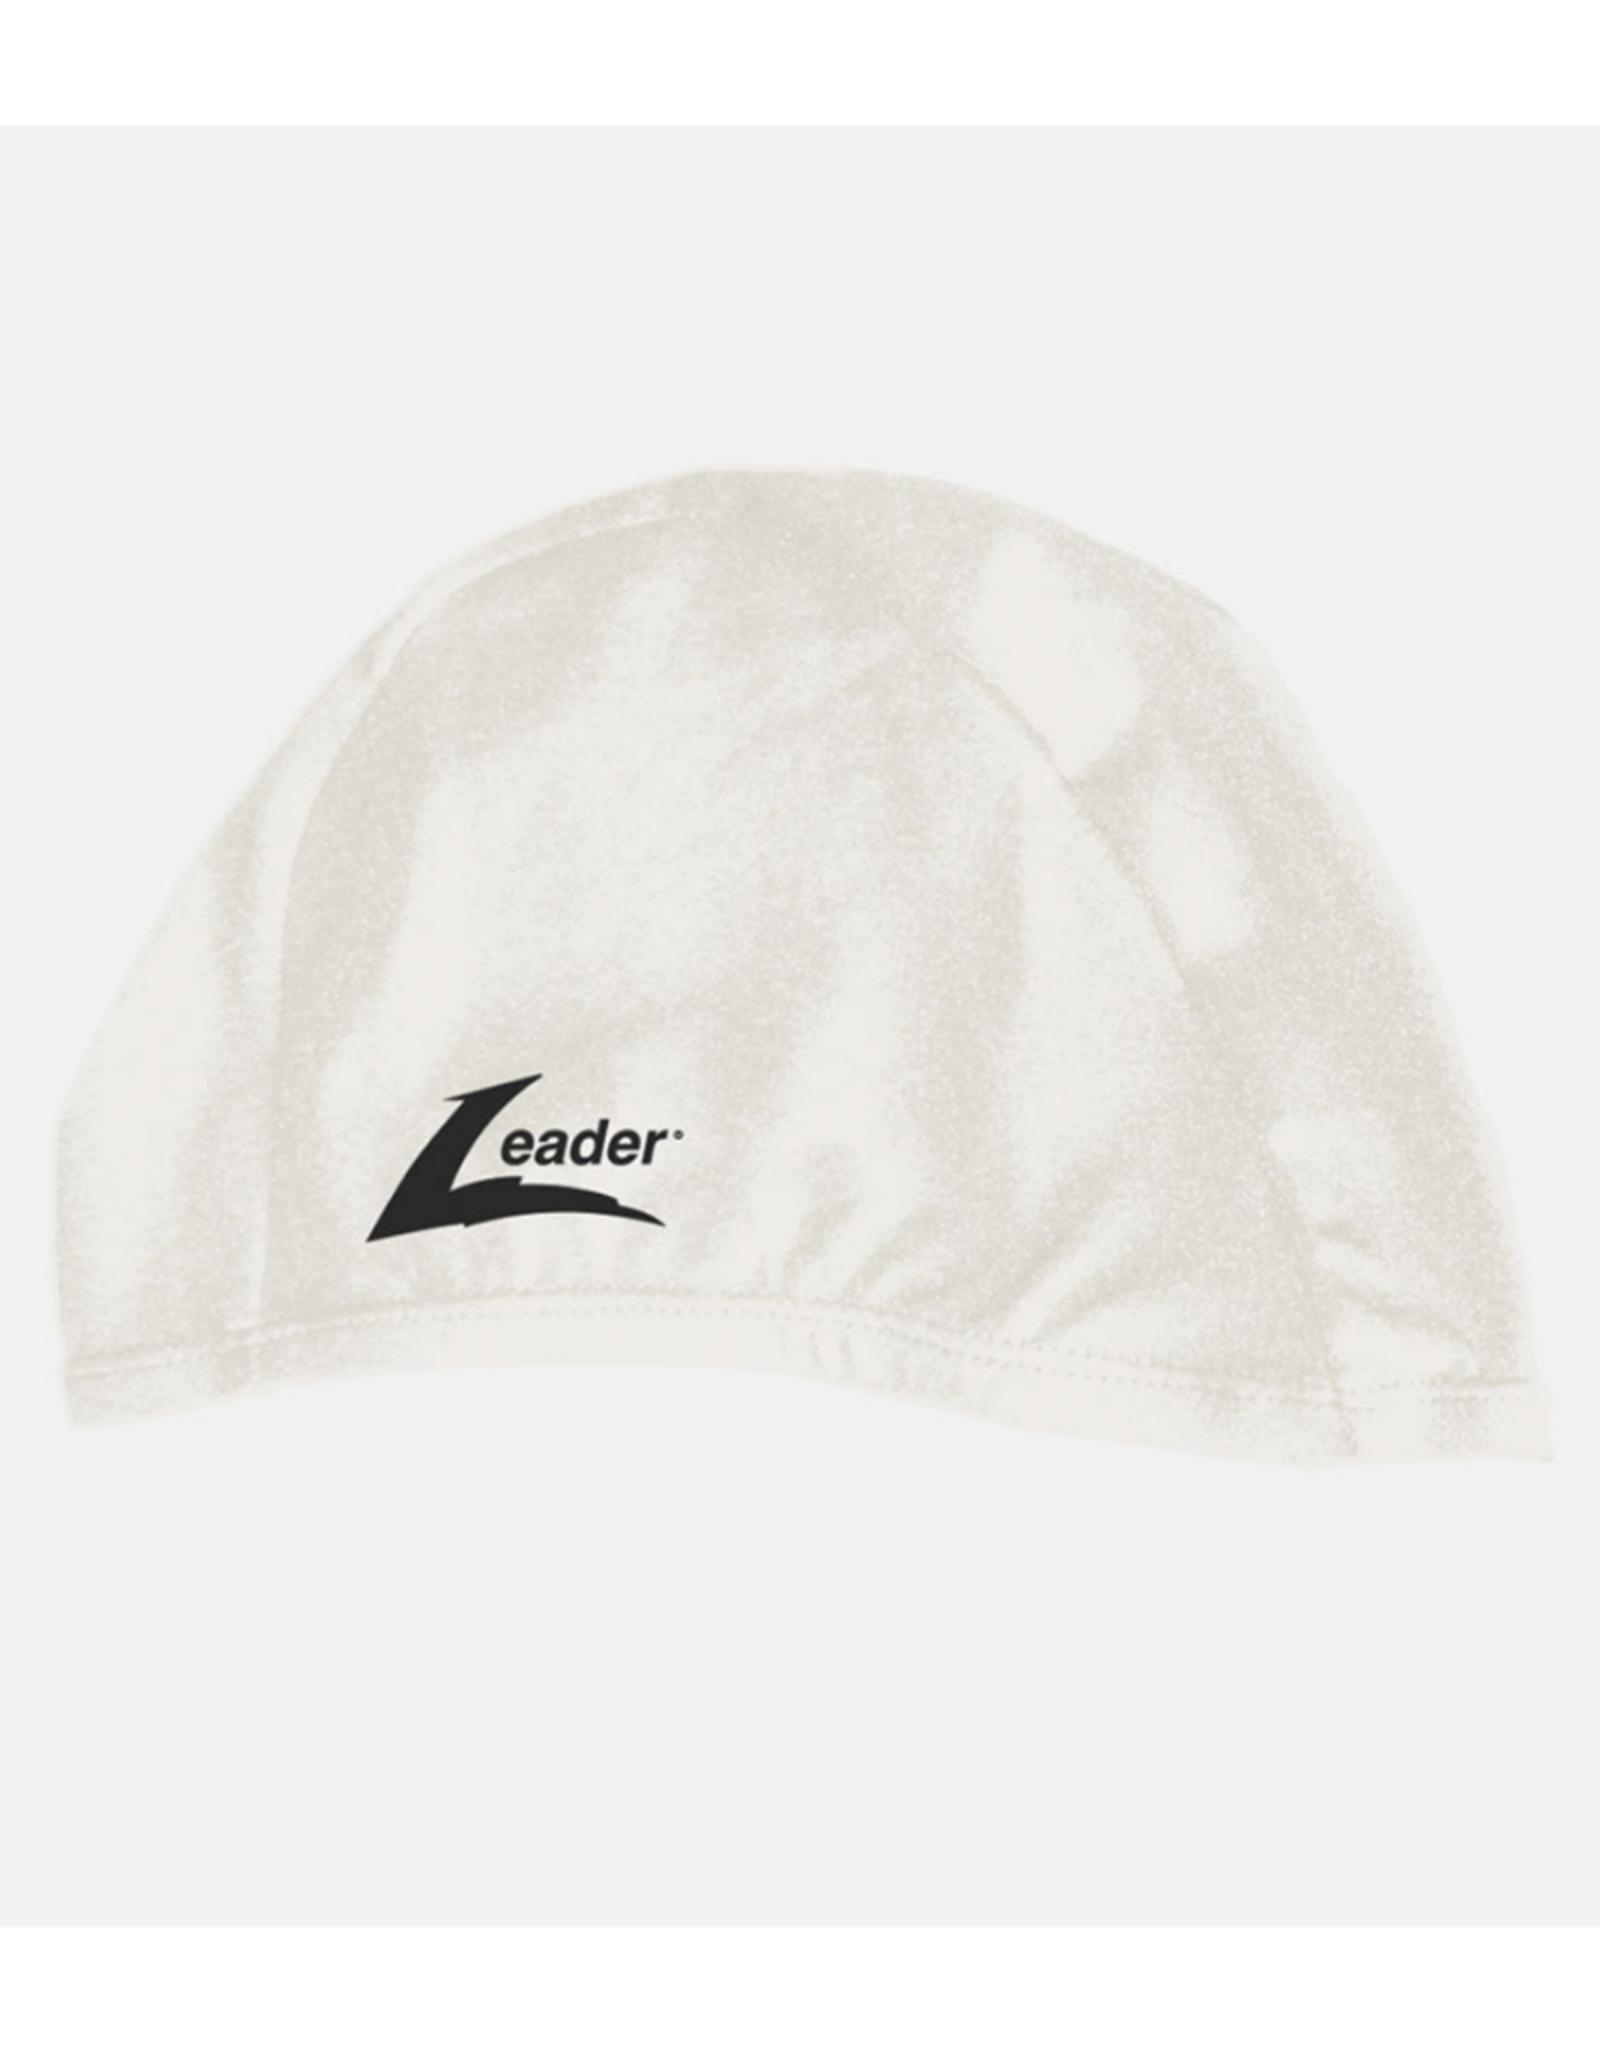 Leader Adult Match Swim Cap White